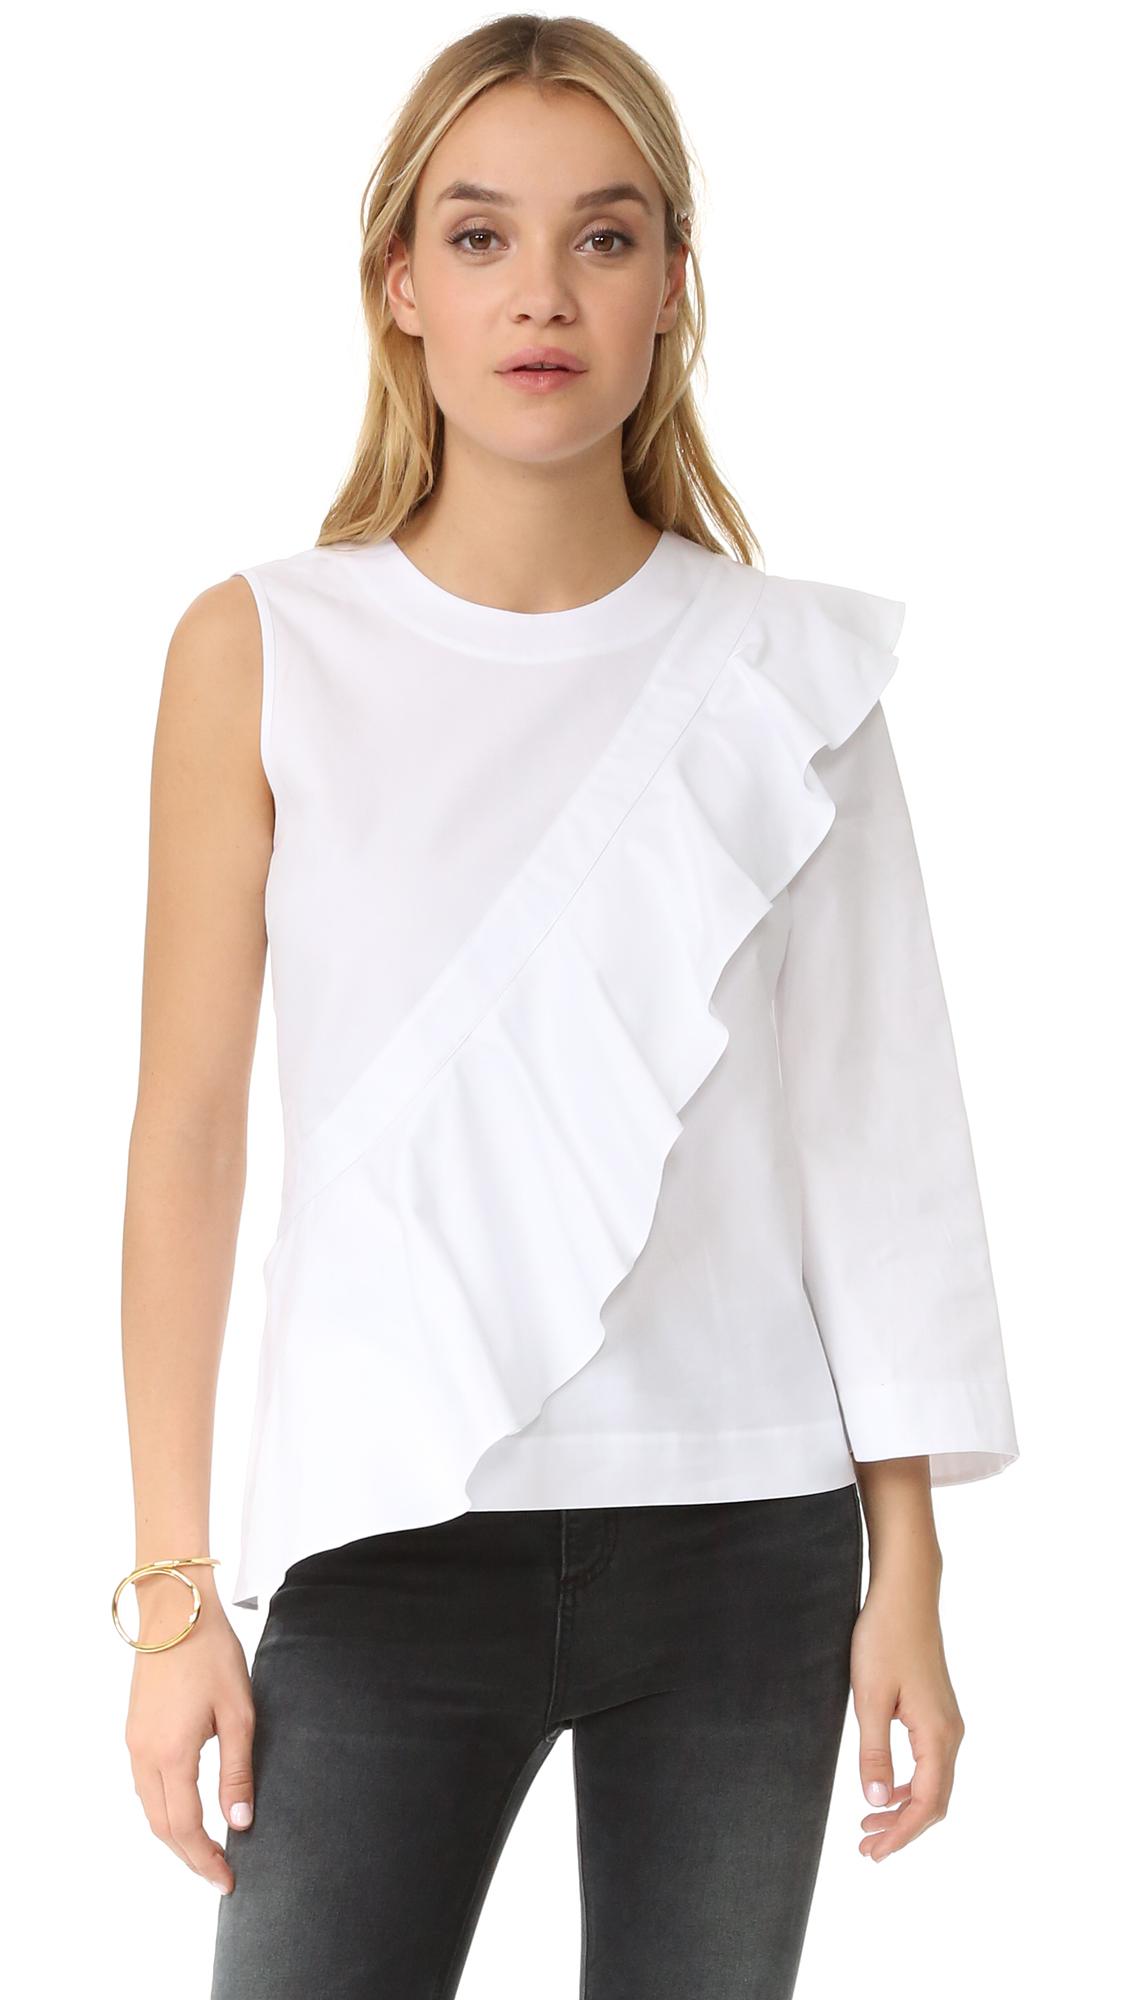 Bcbgmaxazria Leilone One Shoulder Ruffle Blouse - White at Shopbop